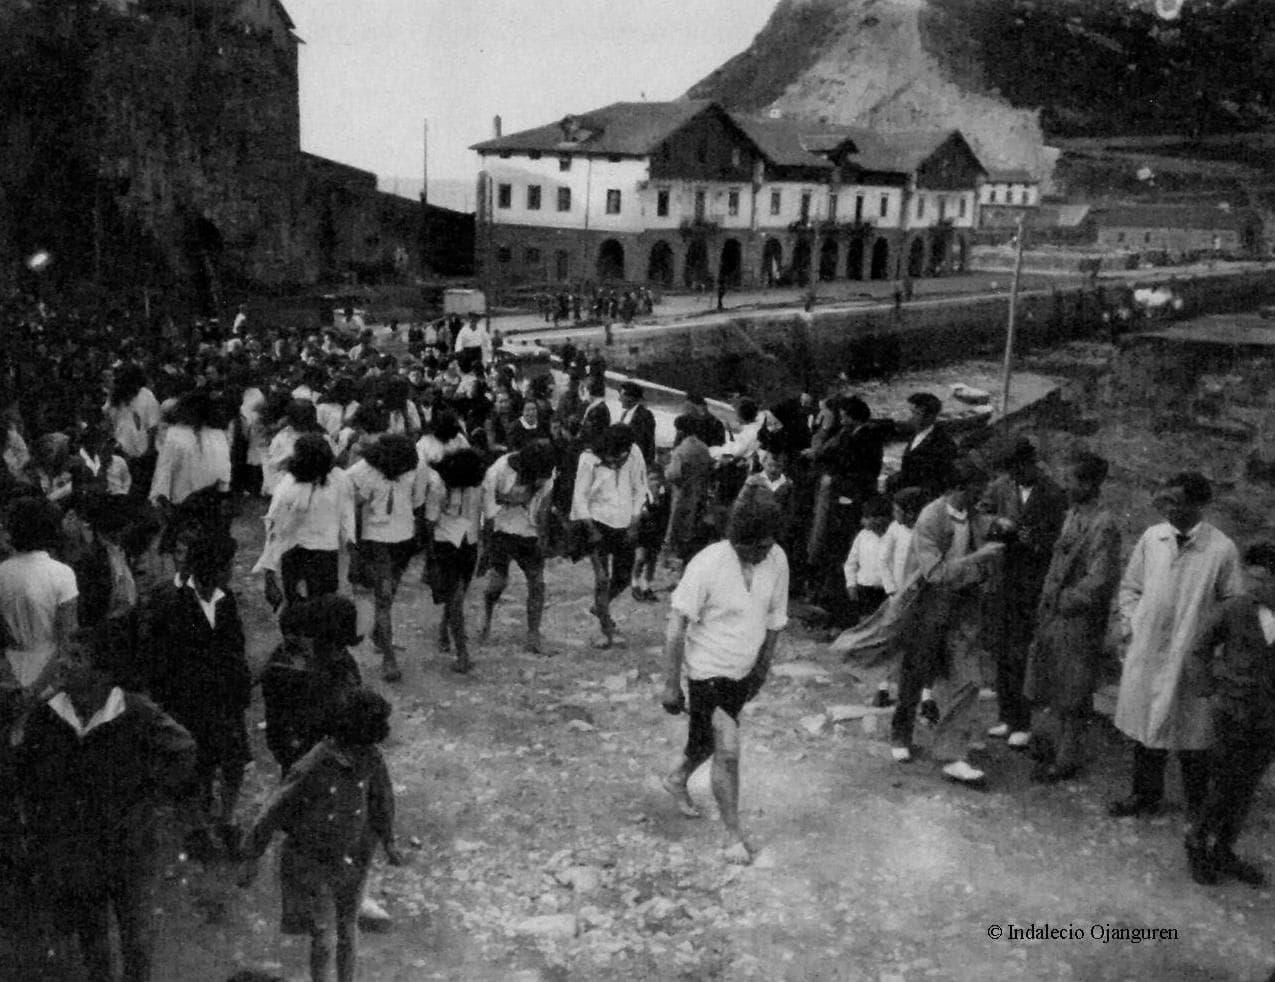 Indalecio Ojanguren